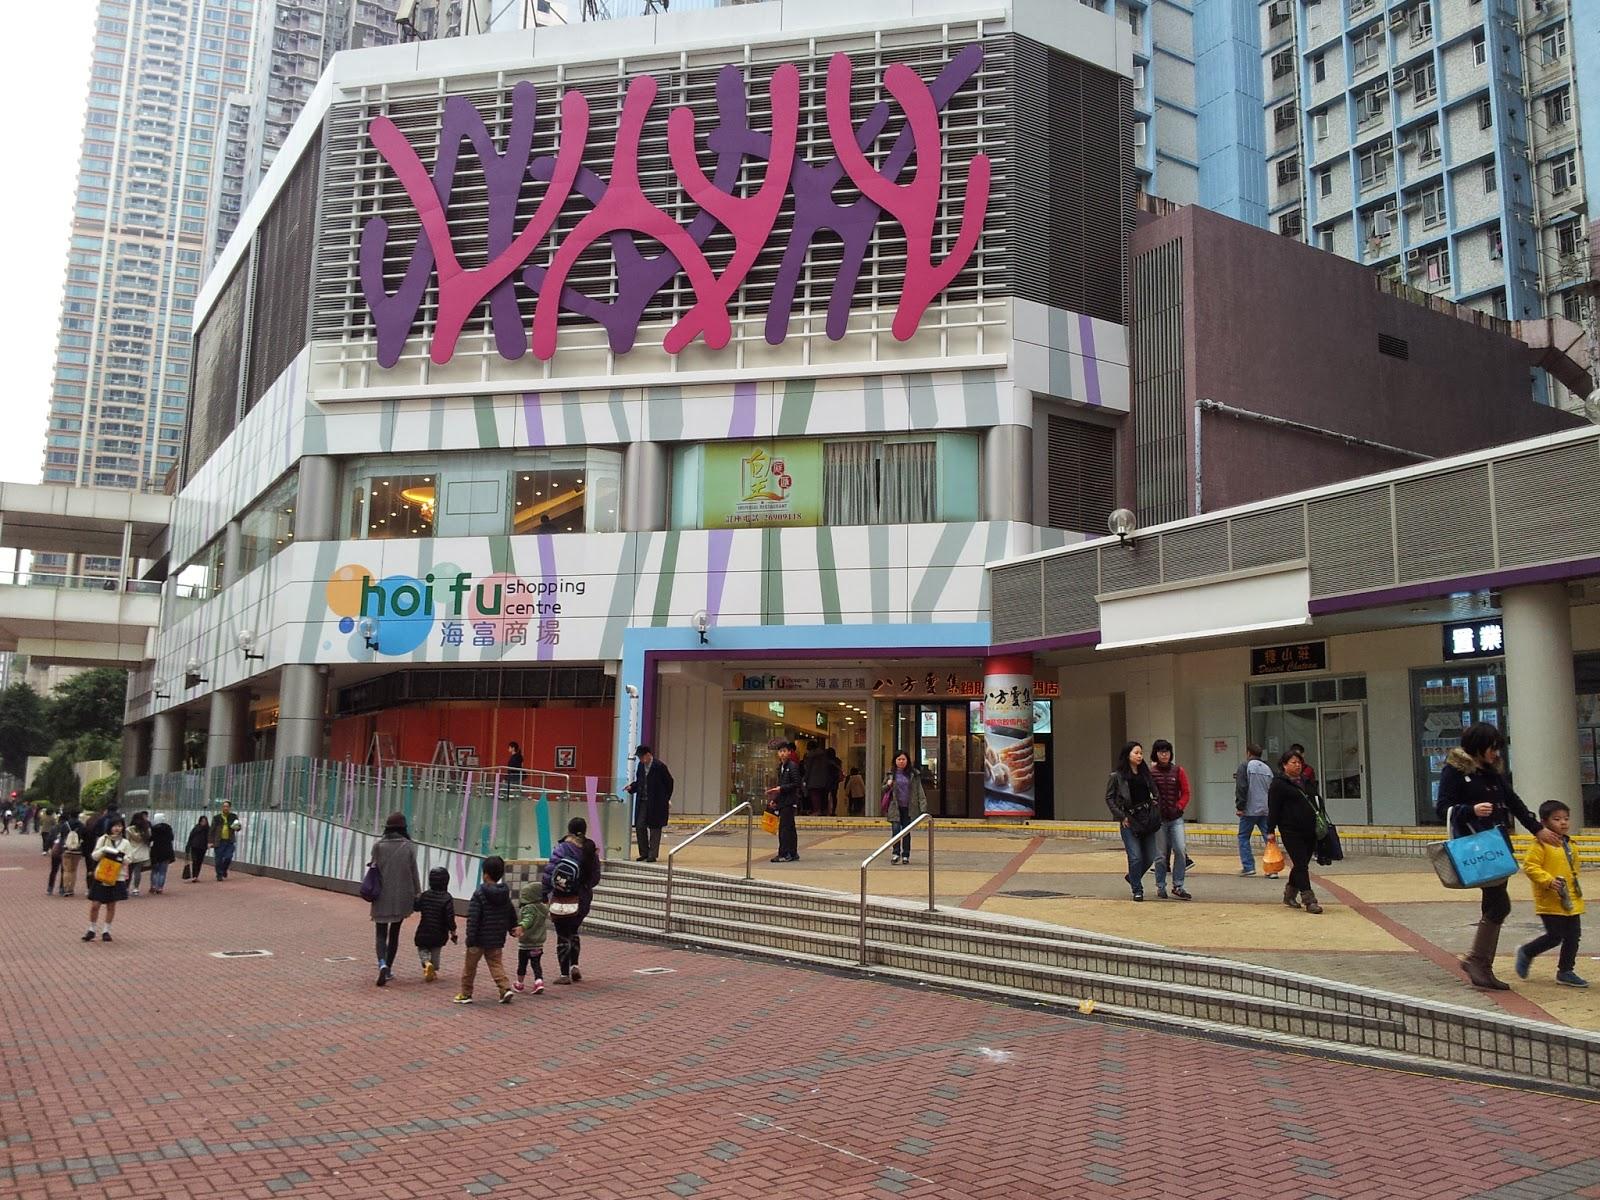 Grassroots O2: [領匯商場] 海富商場 @2015-01-31